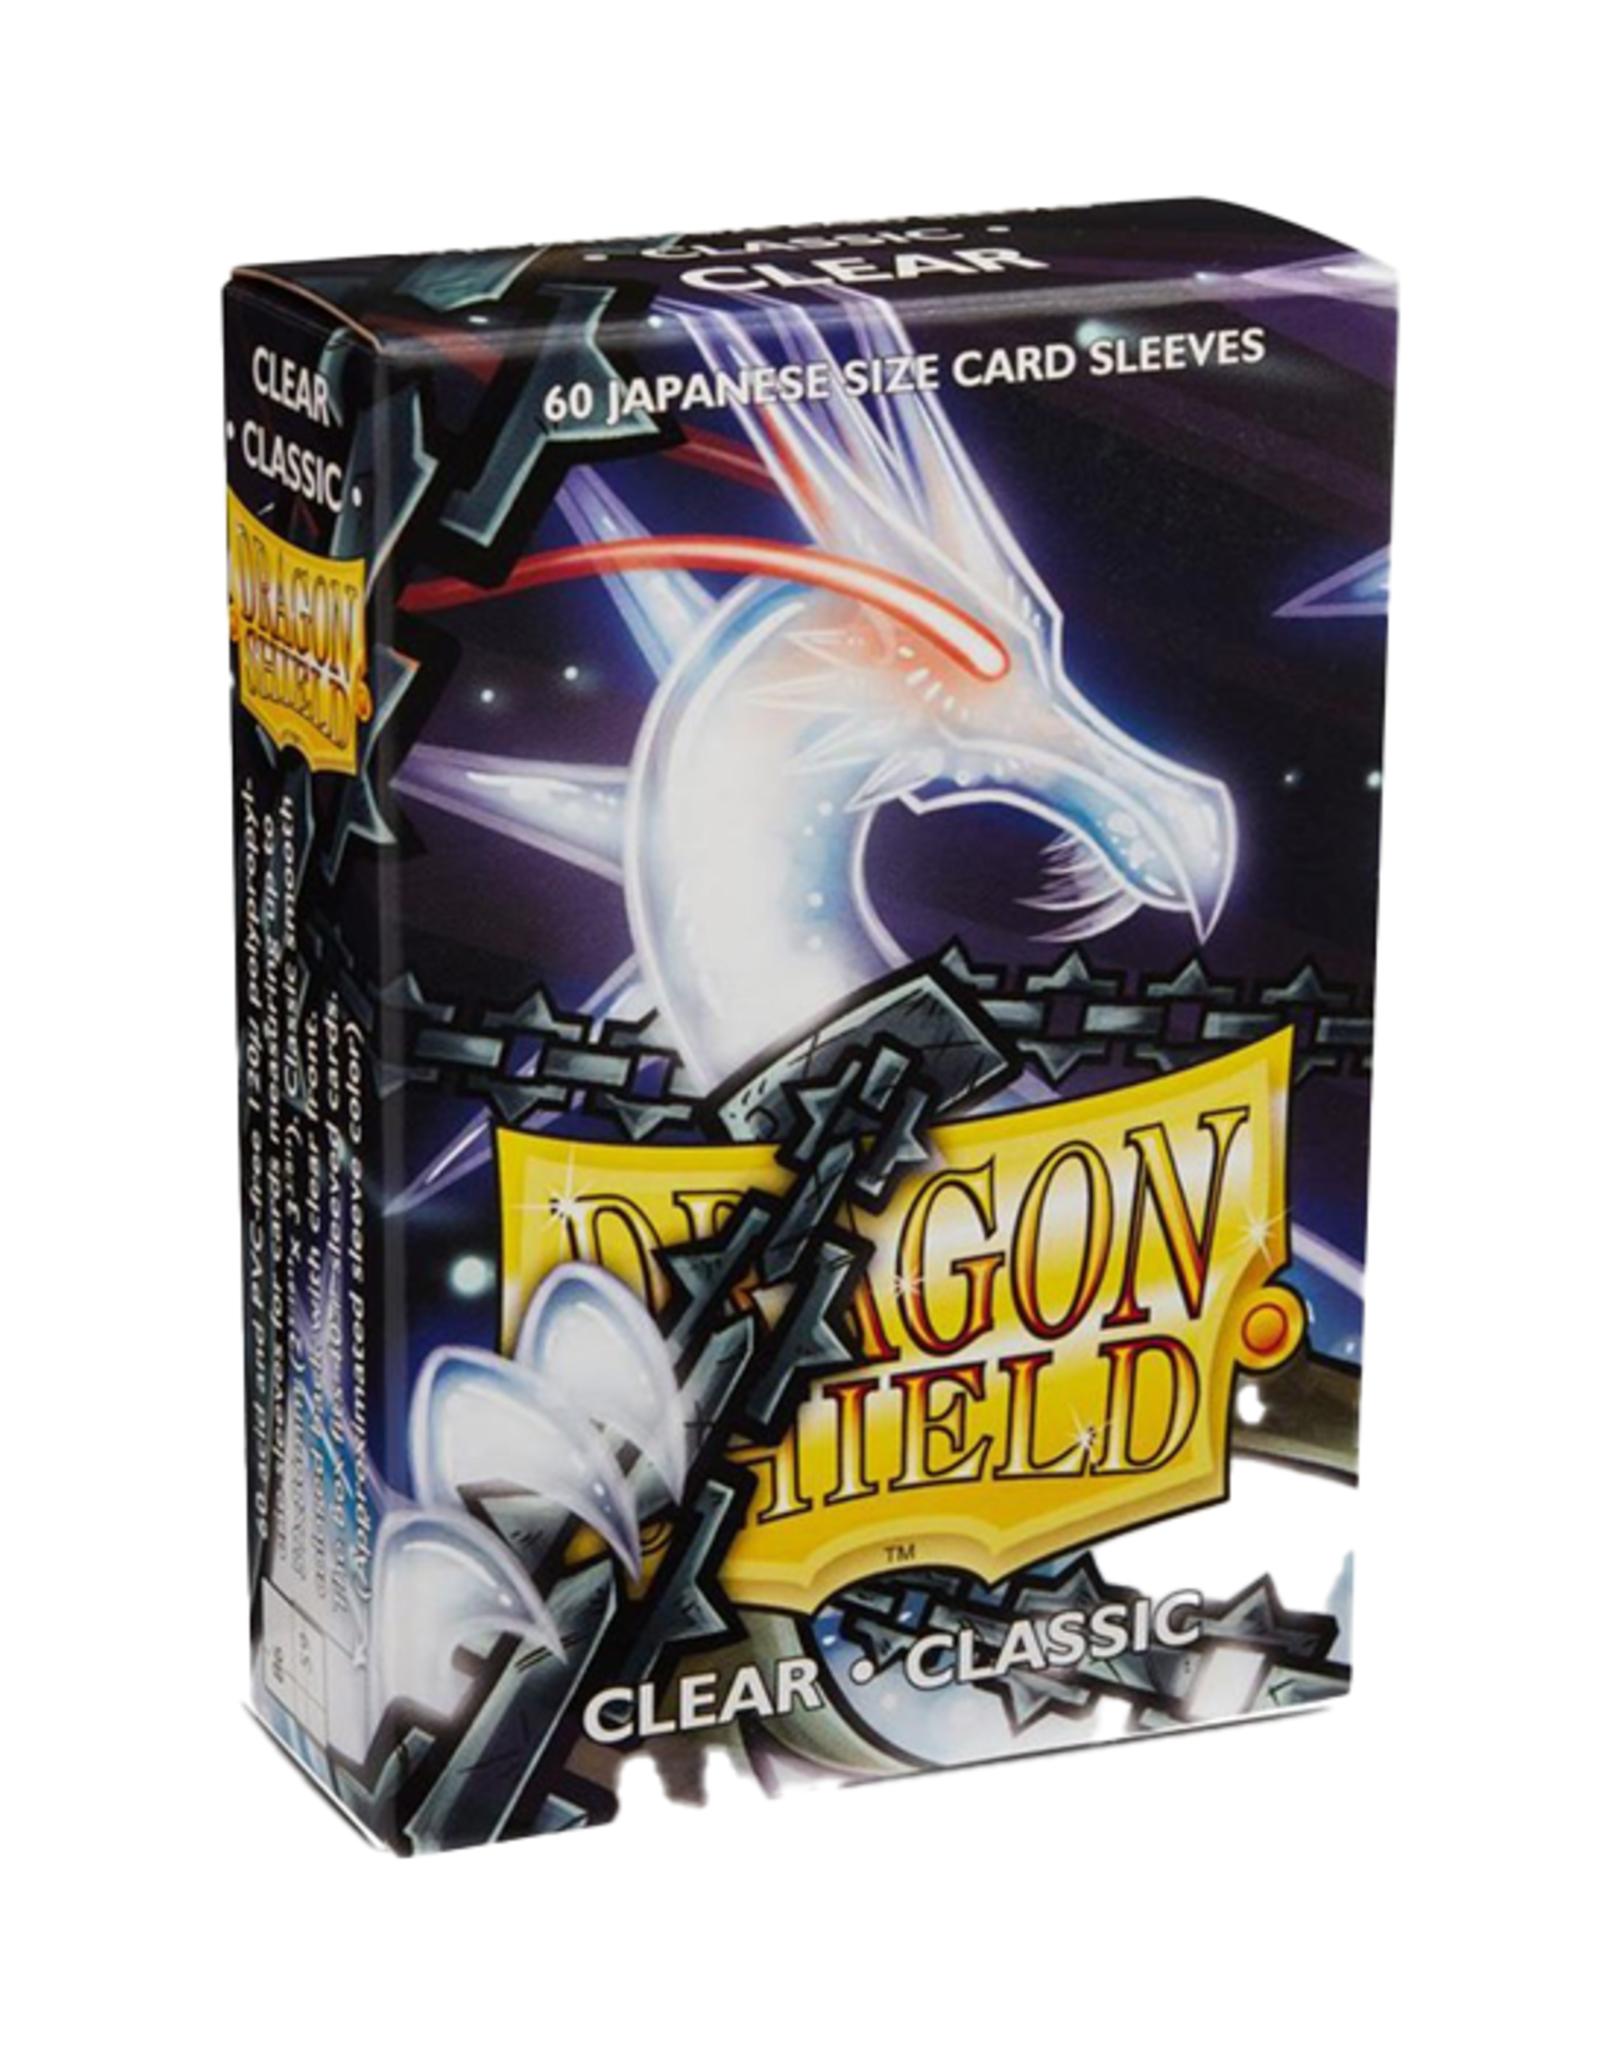 Dragon Shield Dragon Shield: Sleeves - Small - Classic - Clear (60)